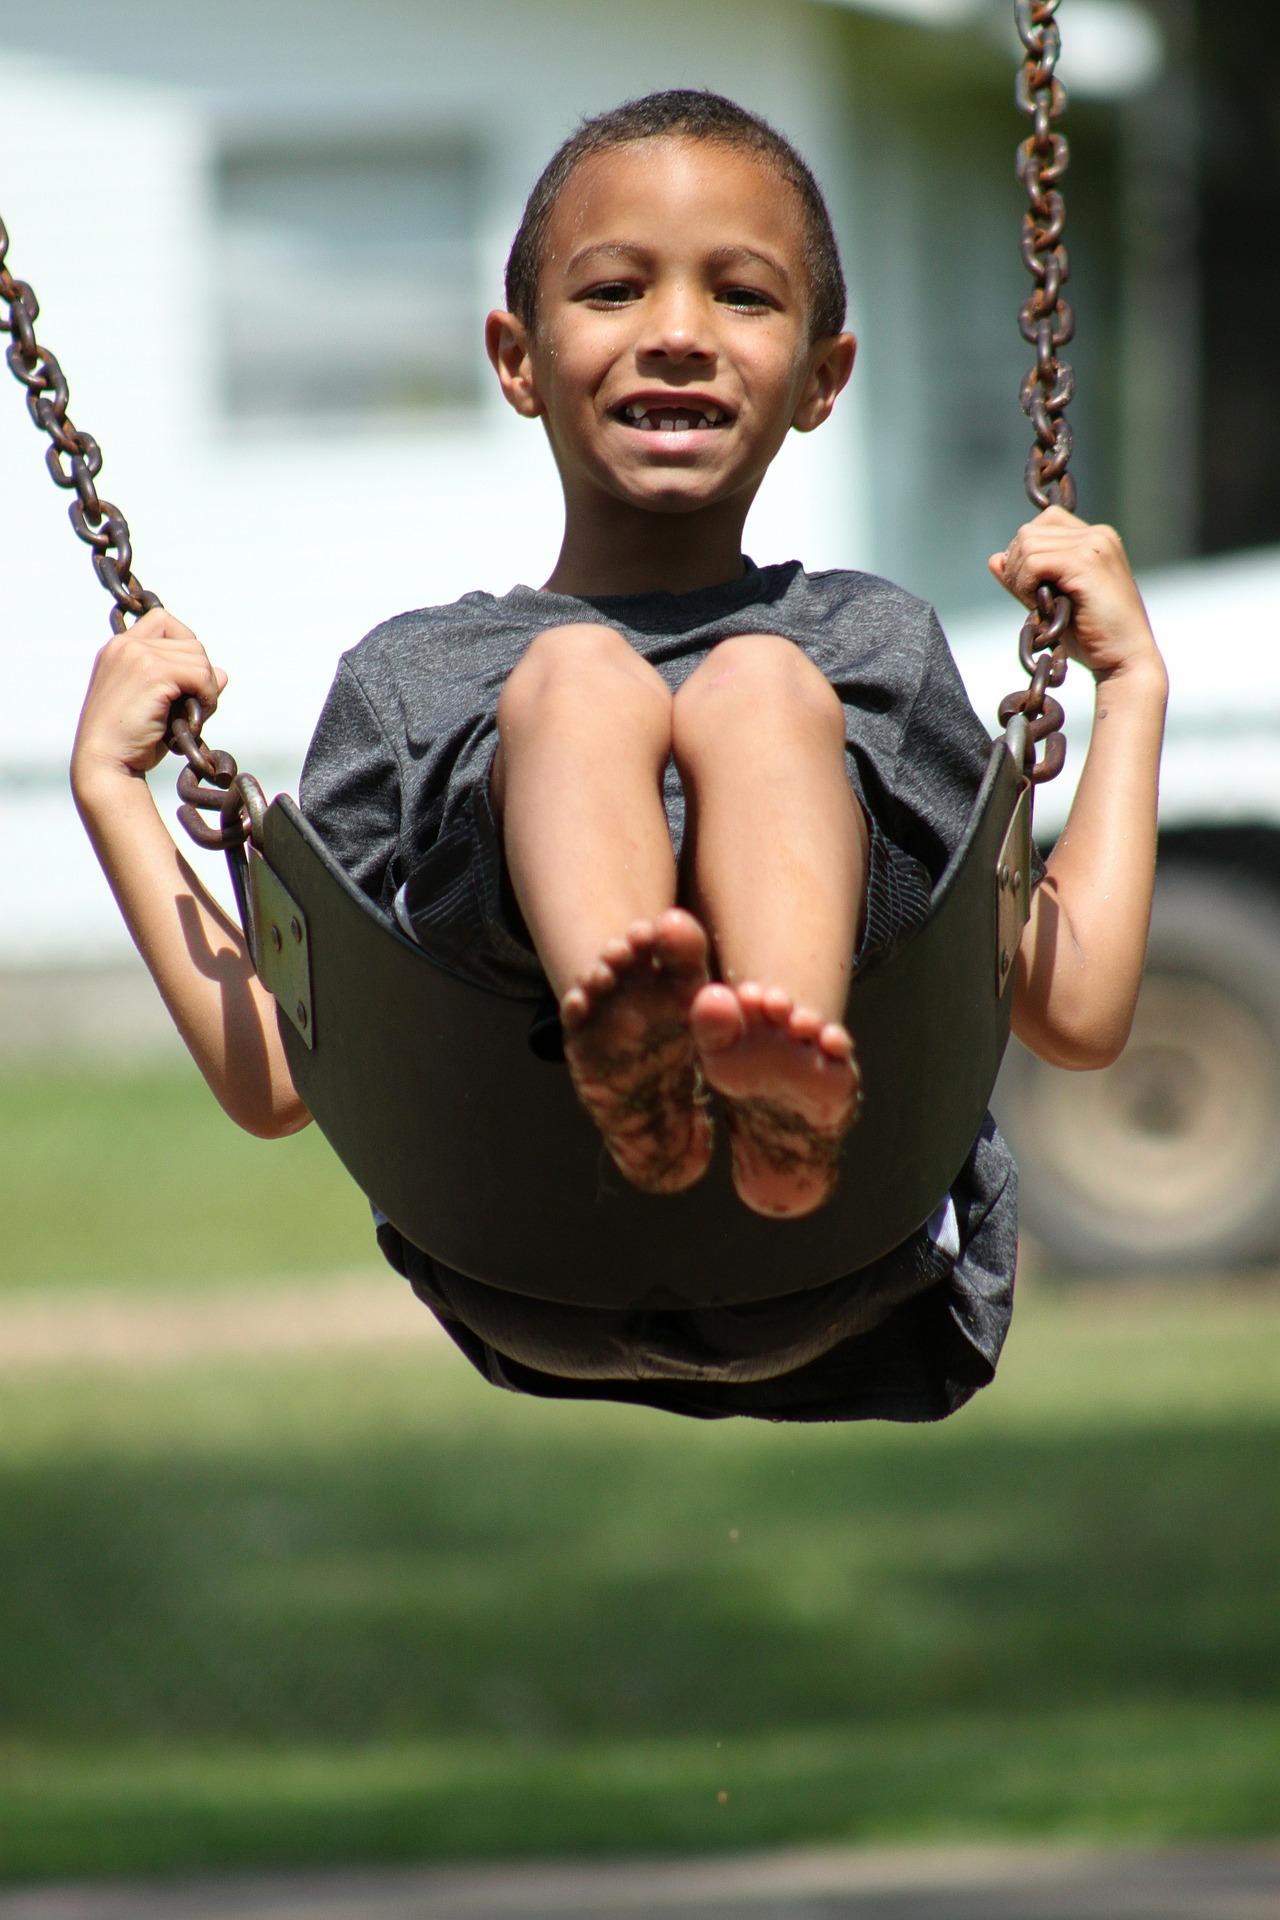 ADHD Kid on Swing